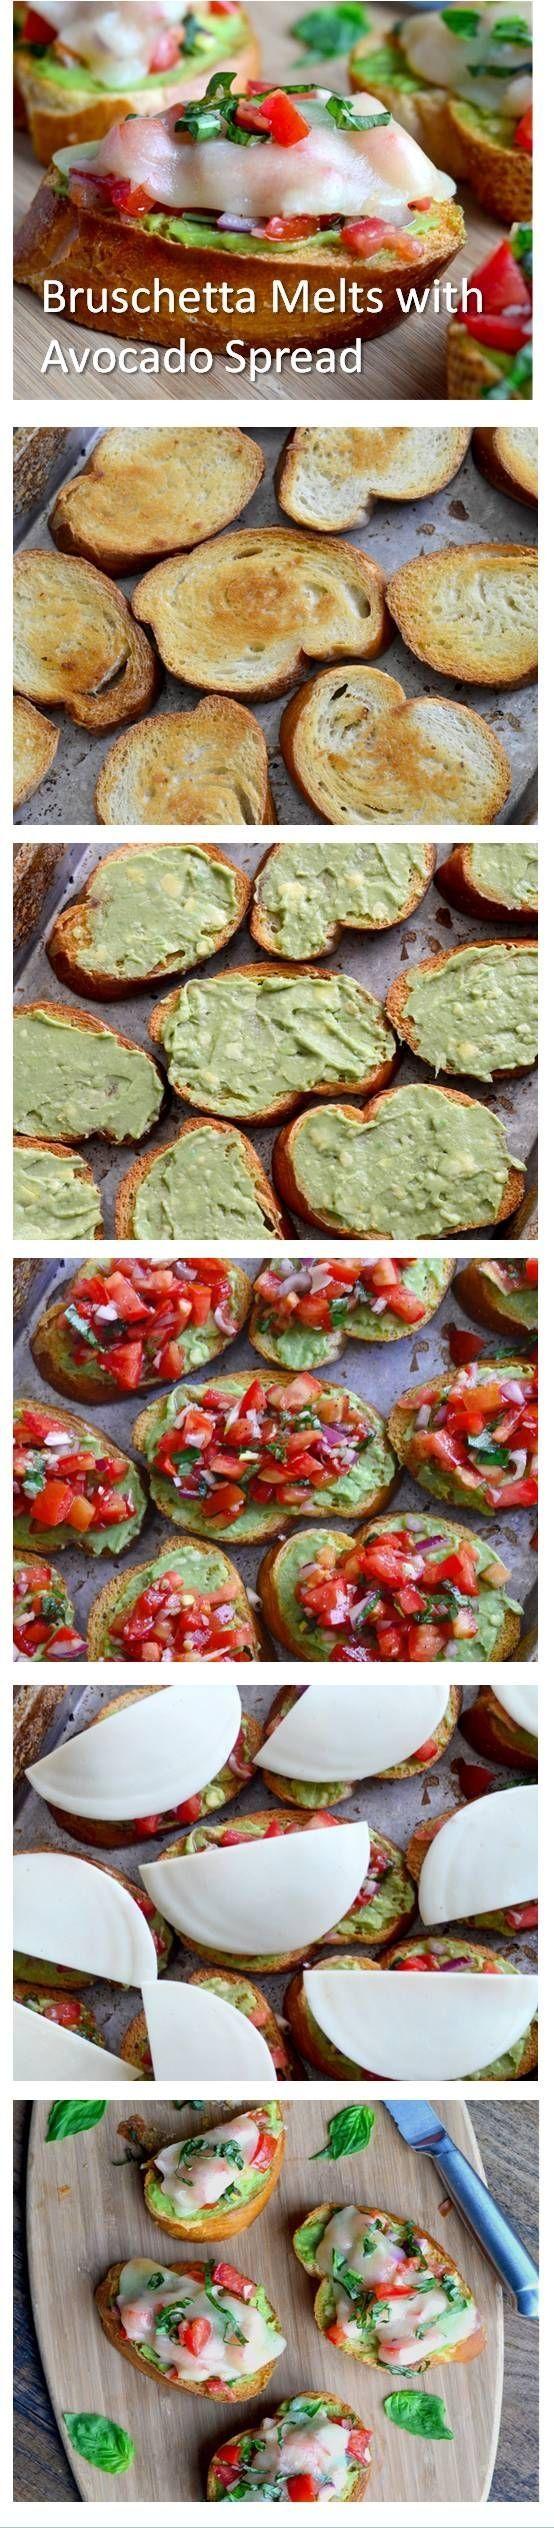 Italian Bruschetta Melts with Avocado Spread